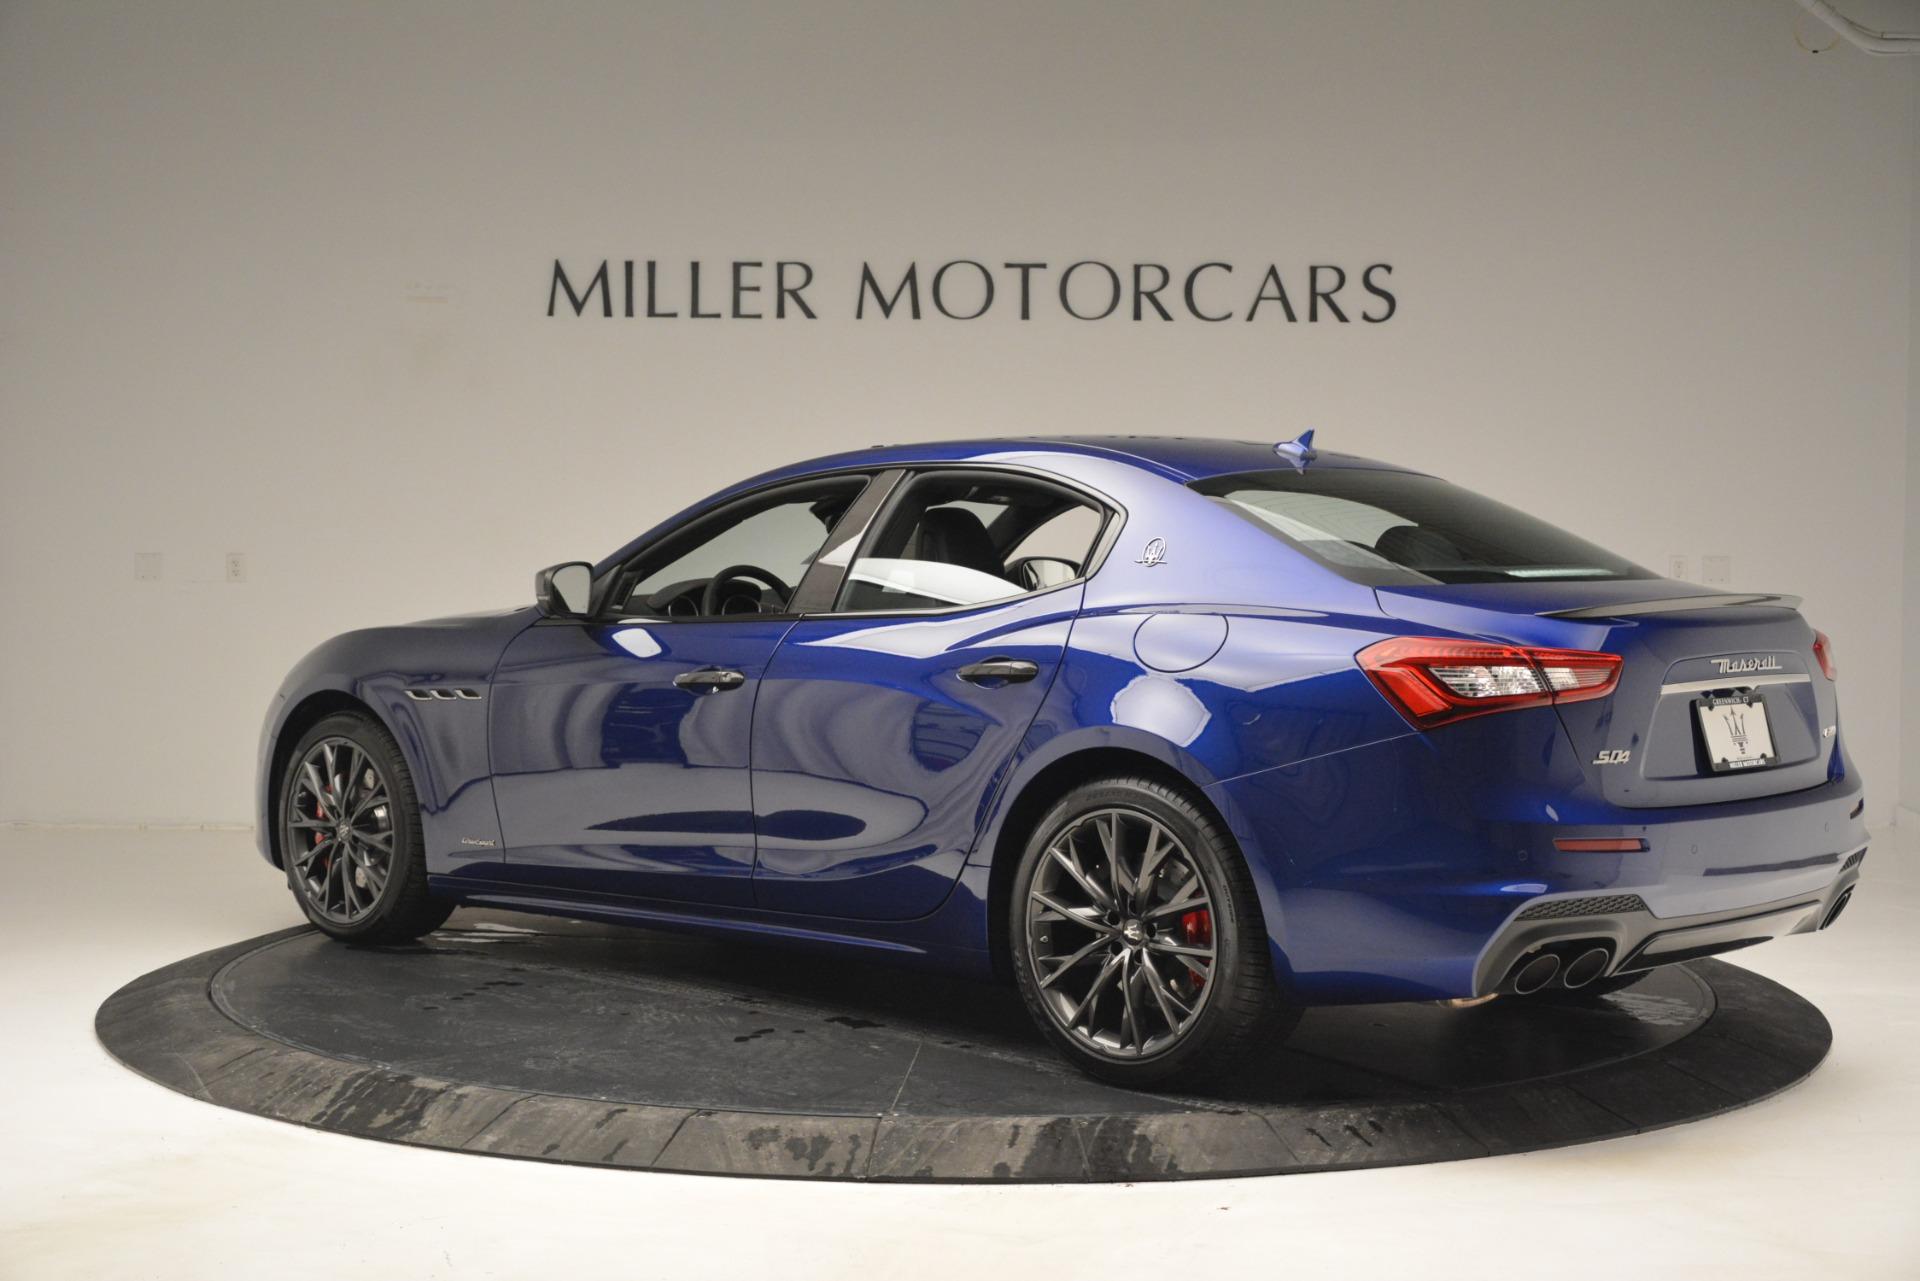 New 2019 Maserati Ghibli S Q4 GranSport For Sale In Greenwich, CT 2928_p4